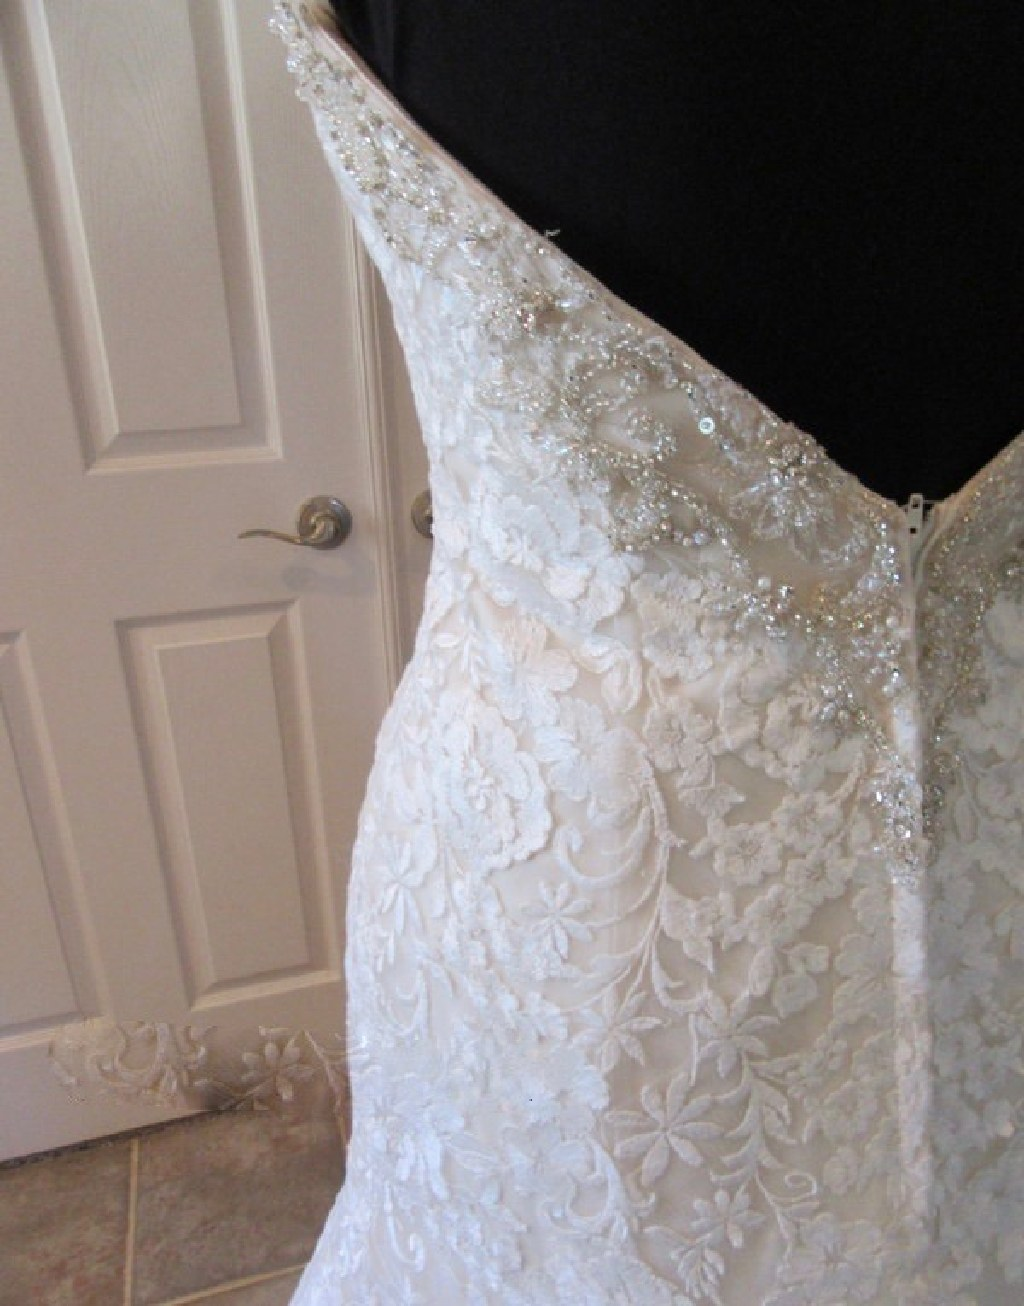 Nelda's Mermaid Lace Wedding Dress